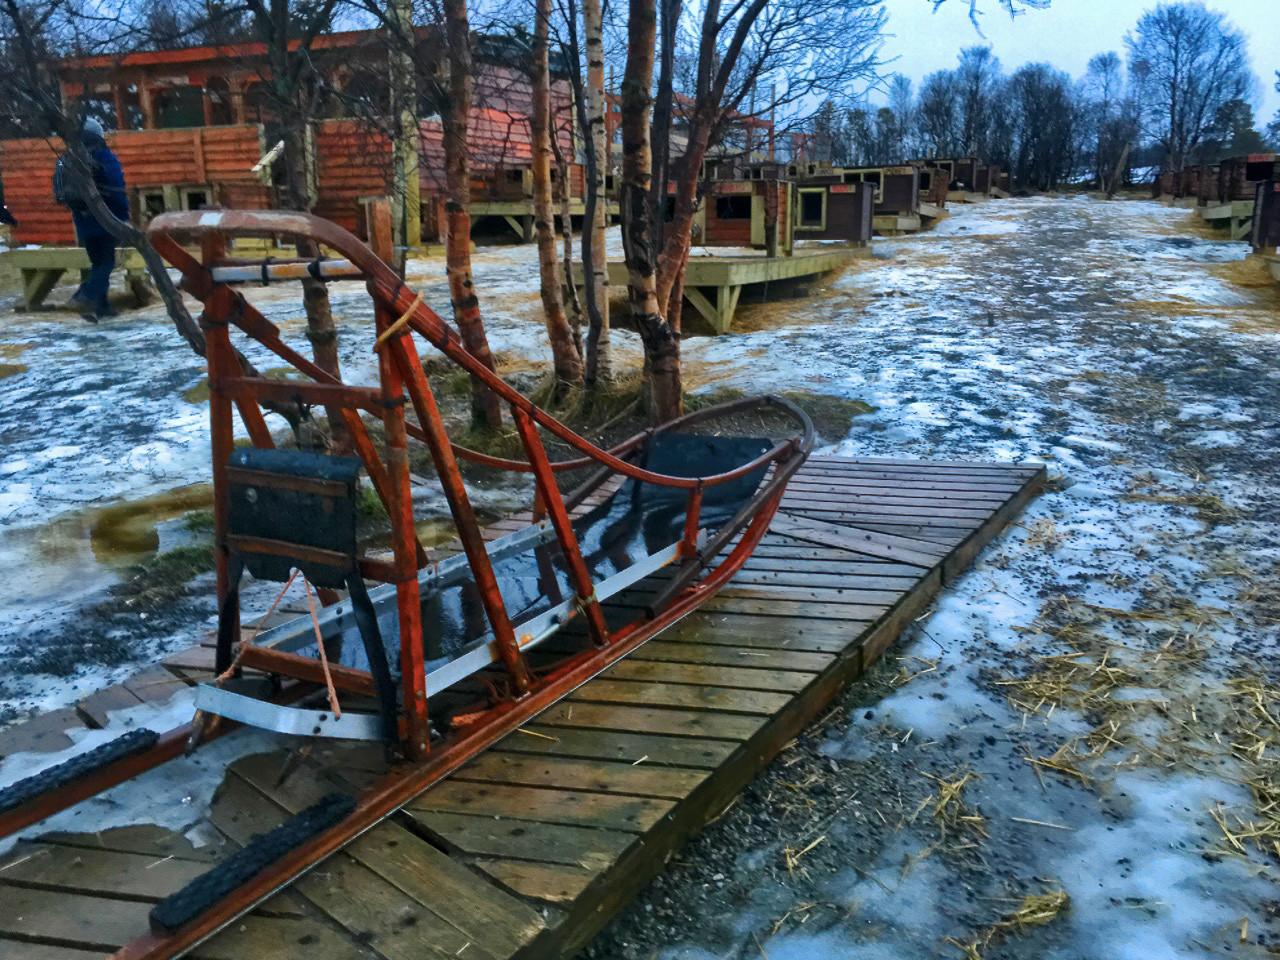 Tromso - Wilderness Center